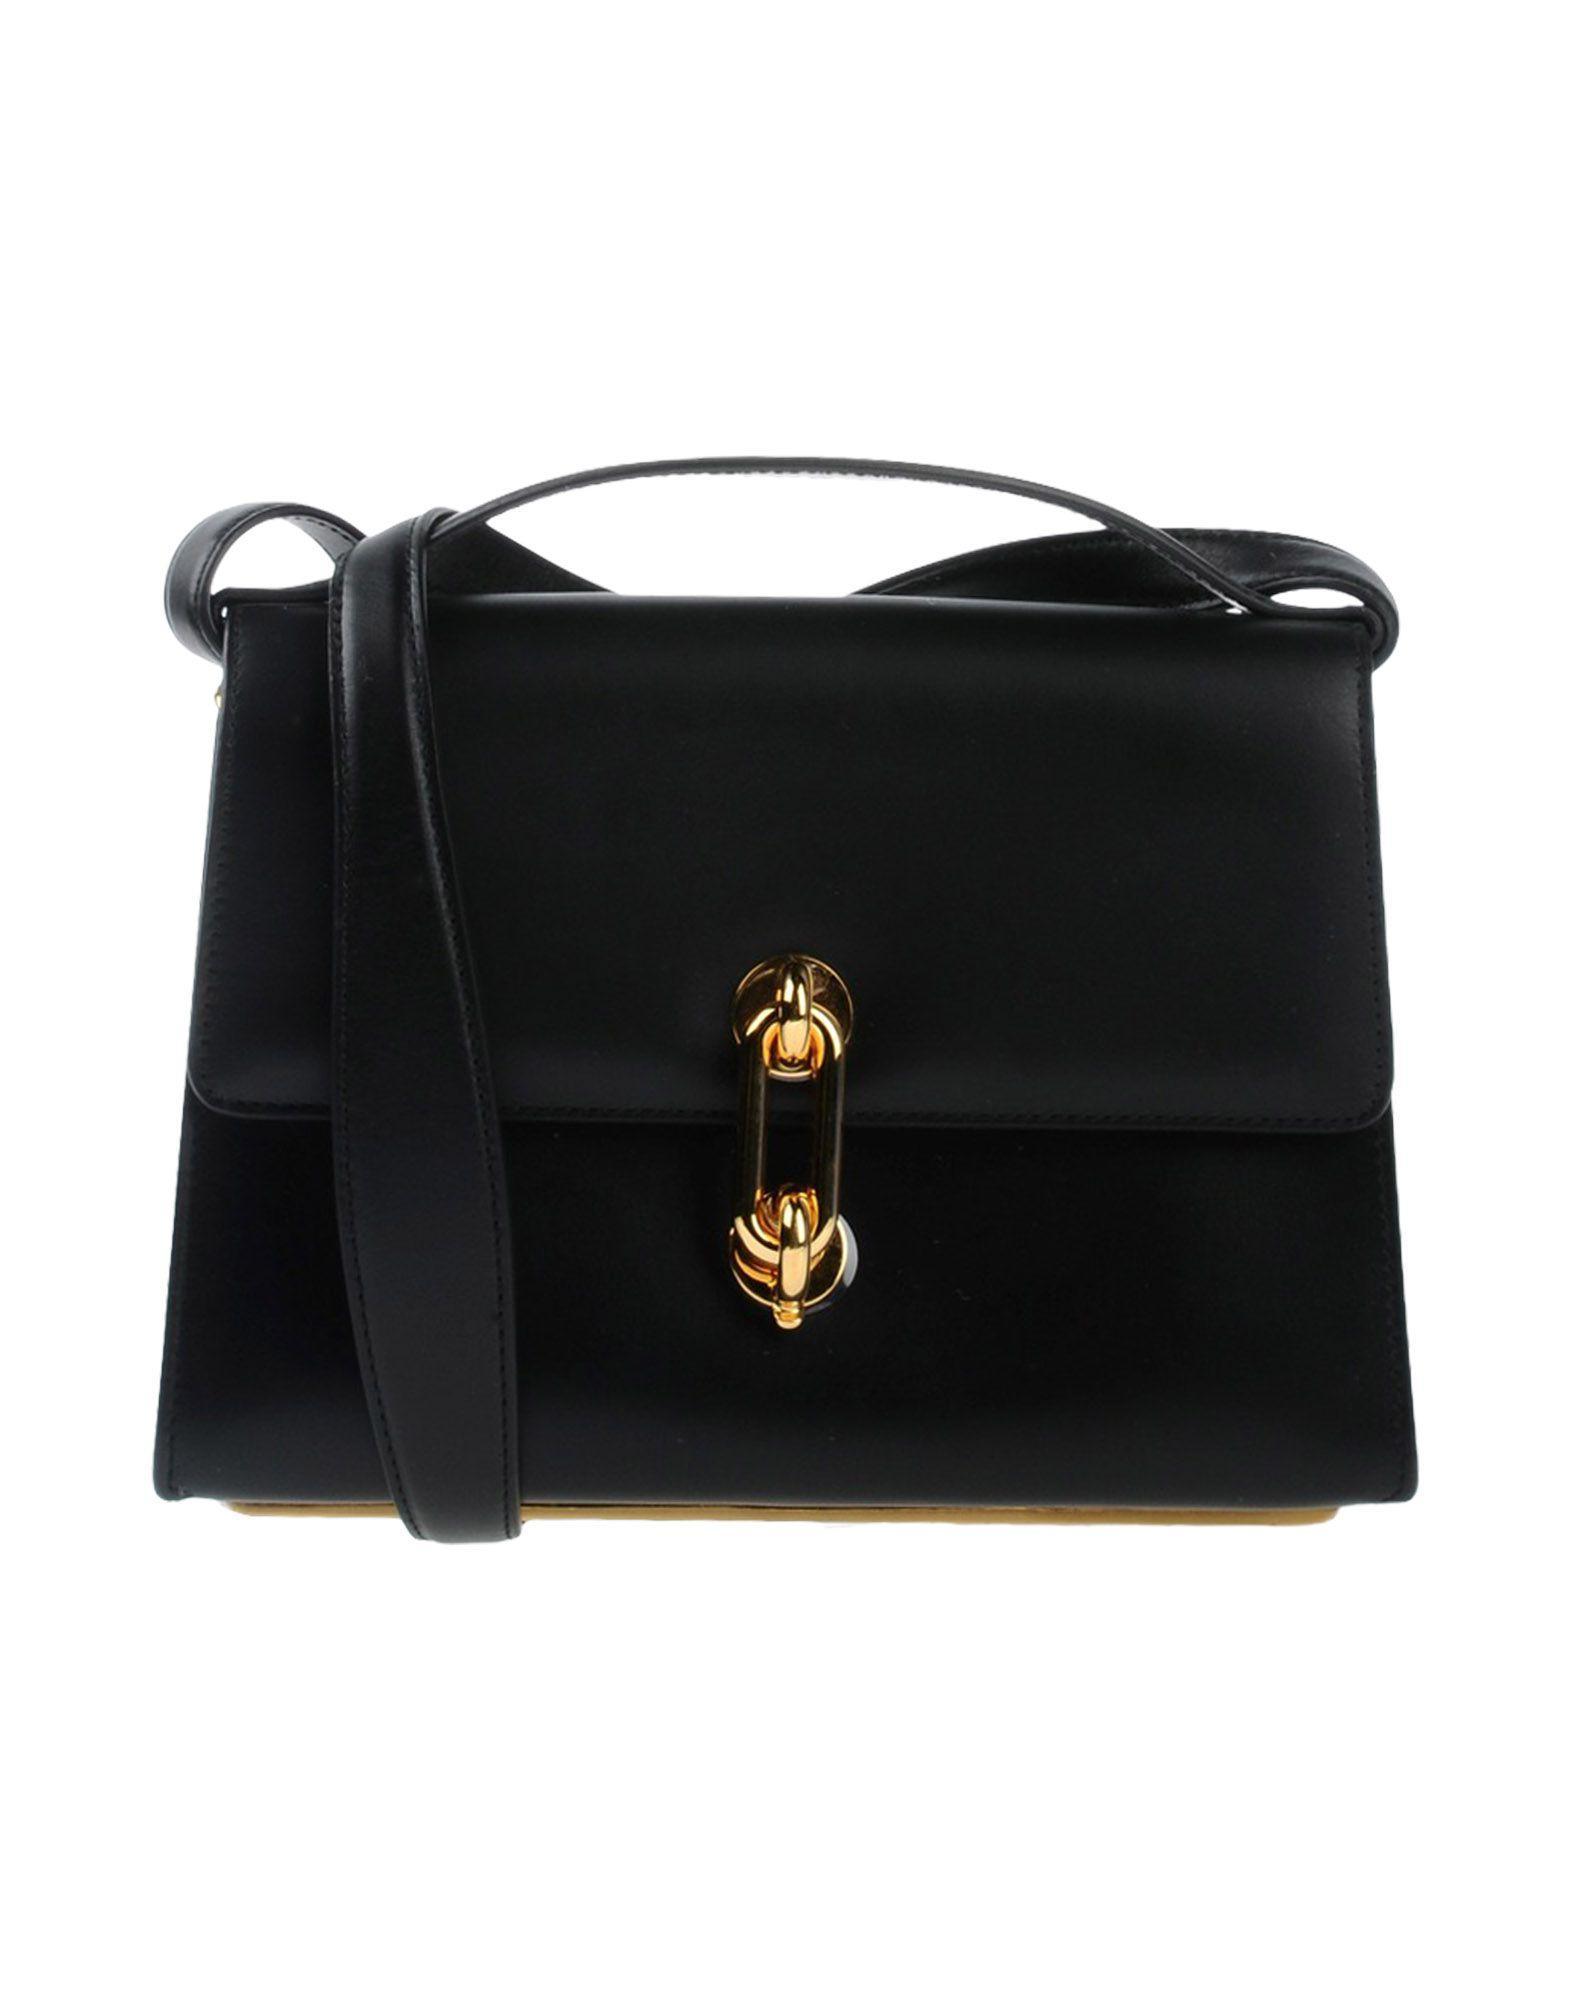 Balenciaga Handbags In Black